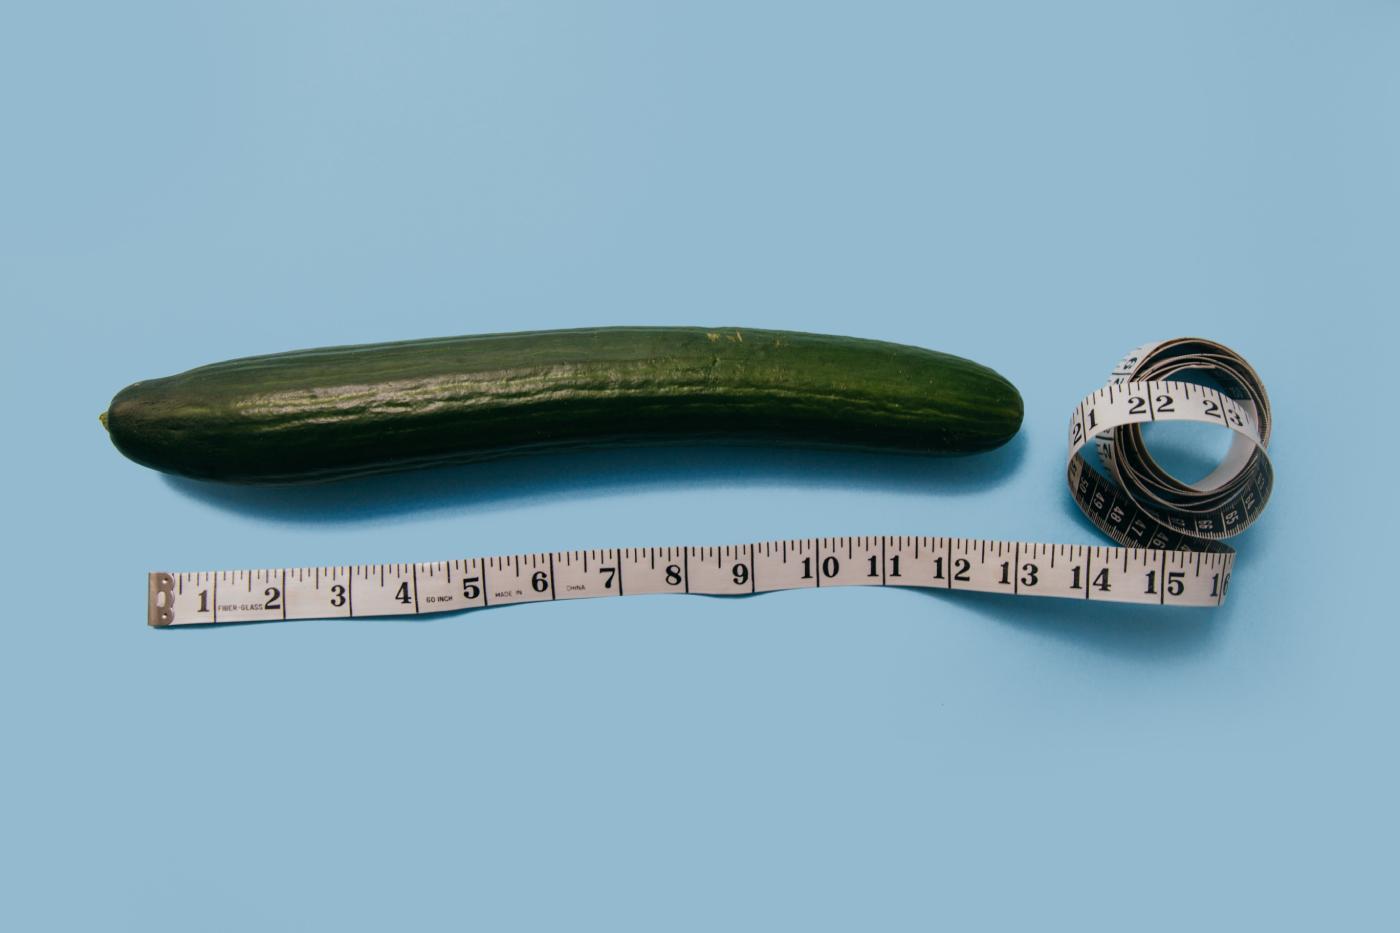 erekció puha pénisz)